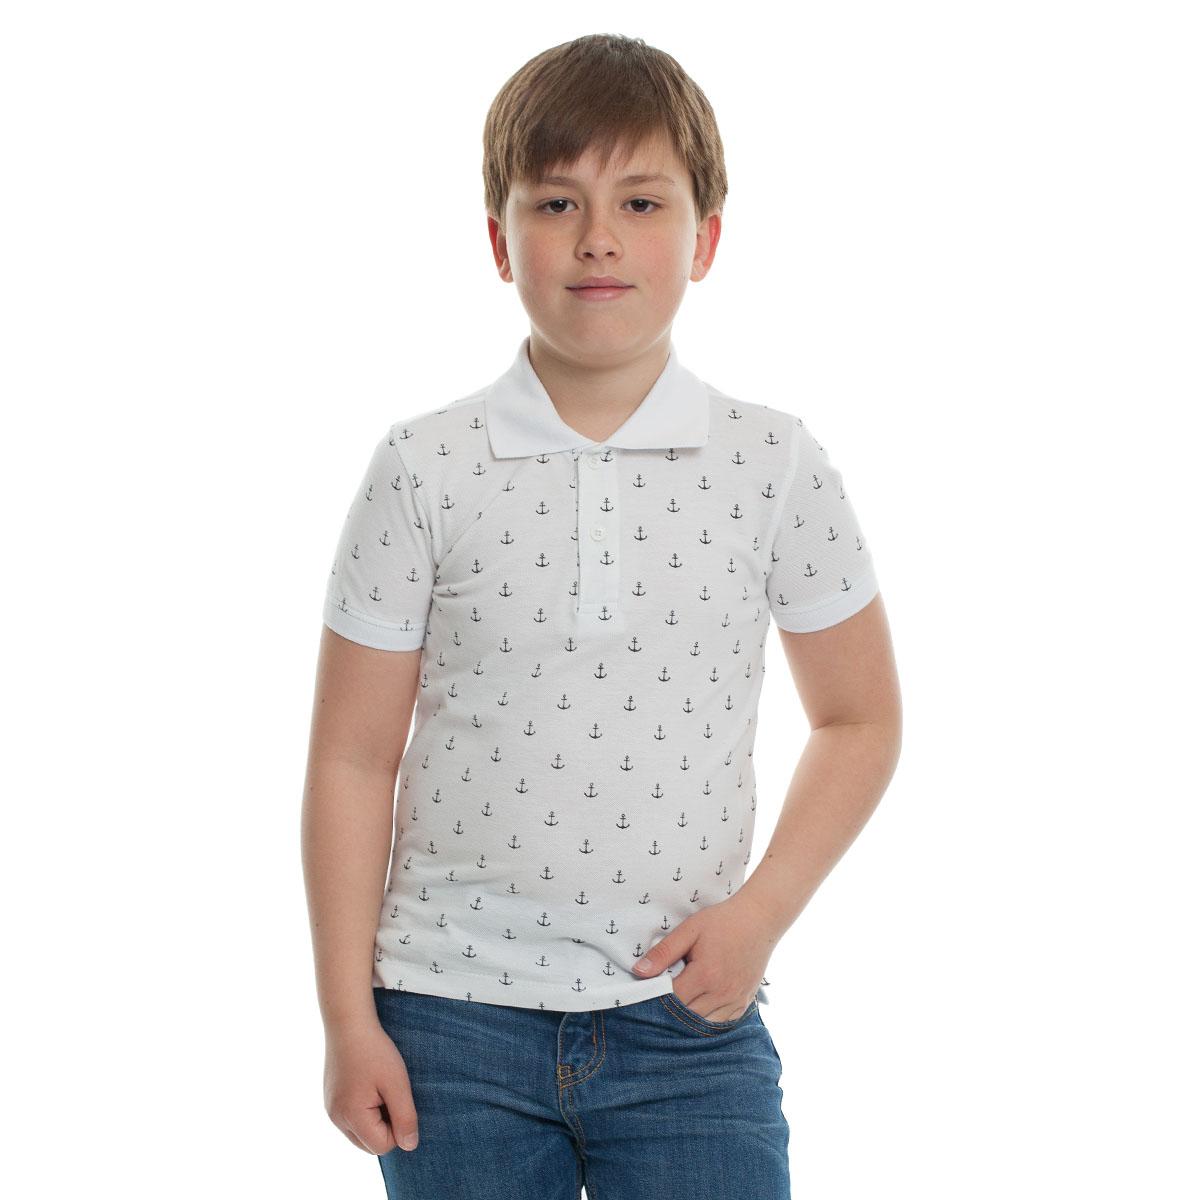 Рубашка поло Sevenext, В-12046 рубашка поло sevenext в 12046